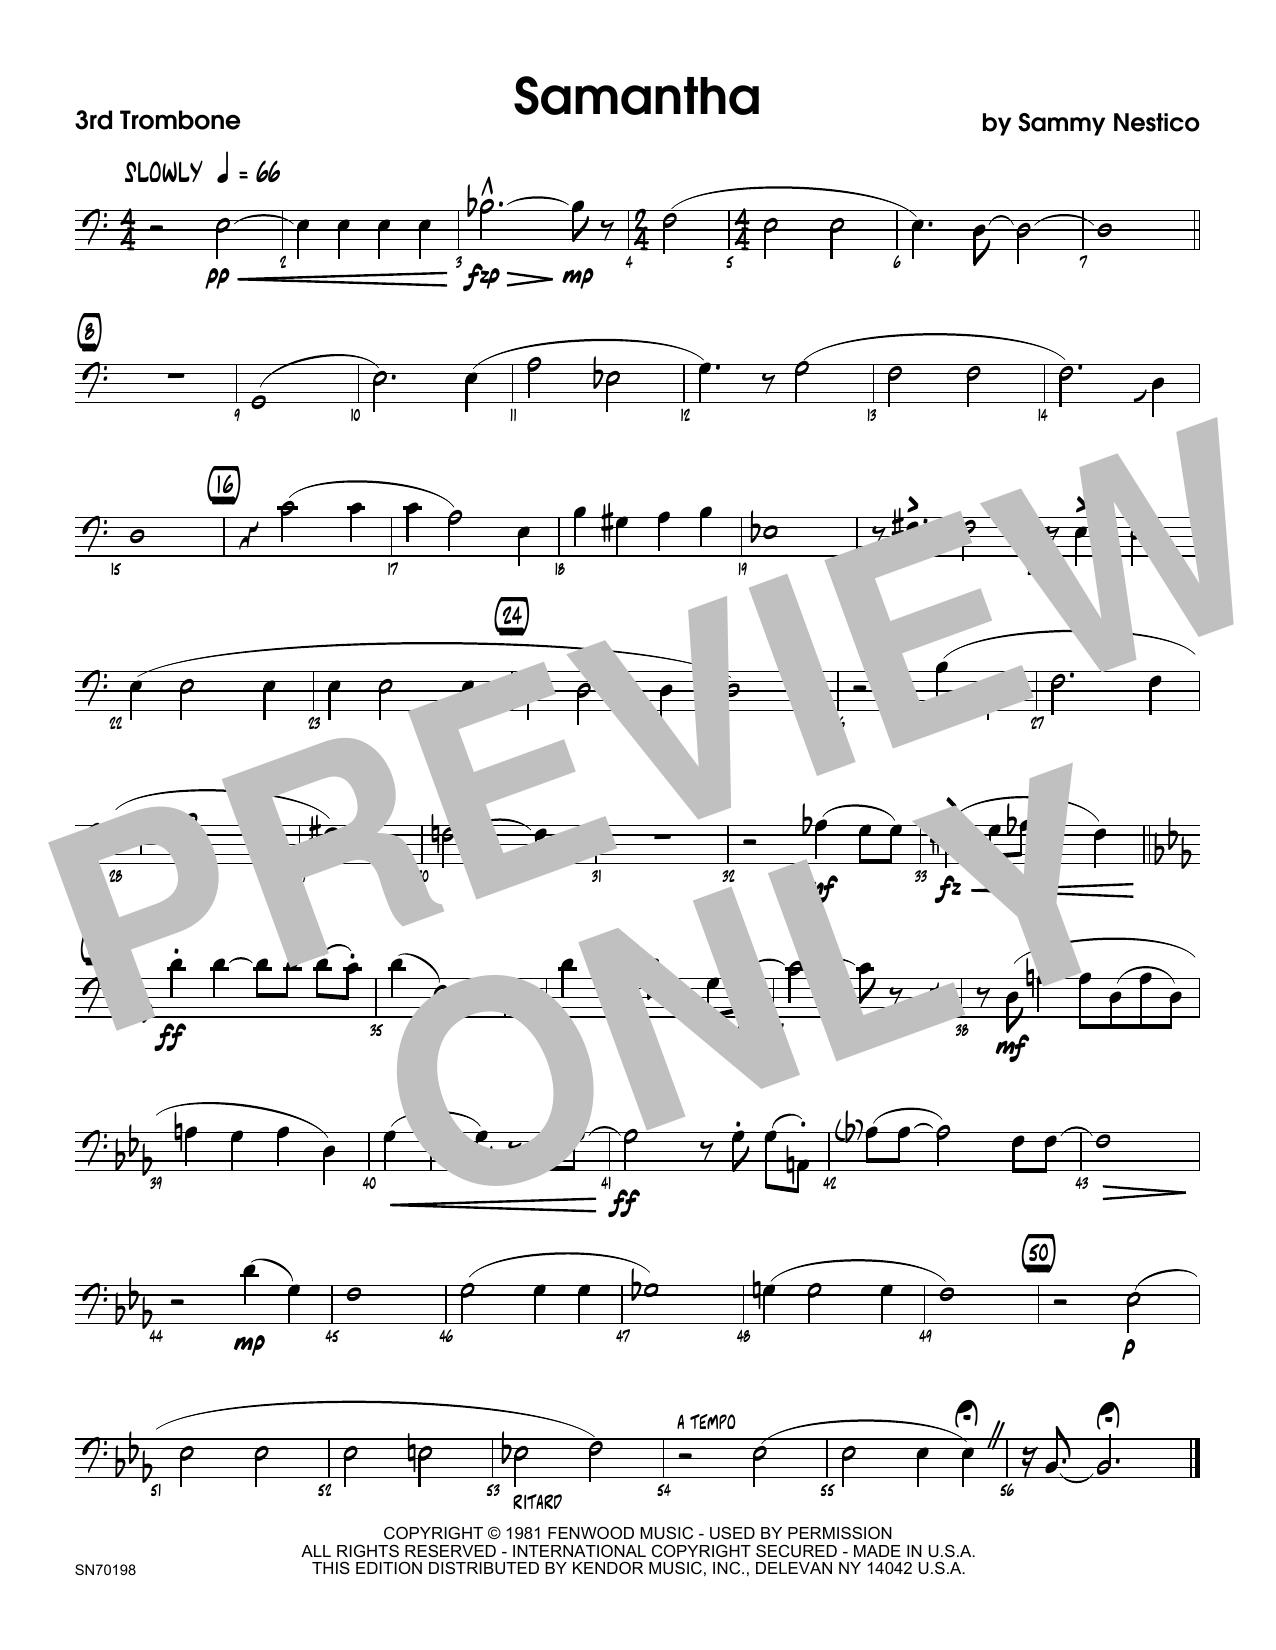 Samantha - 3rd Trombone